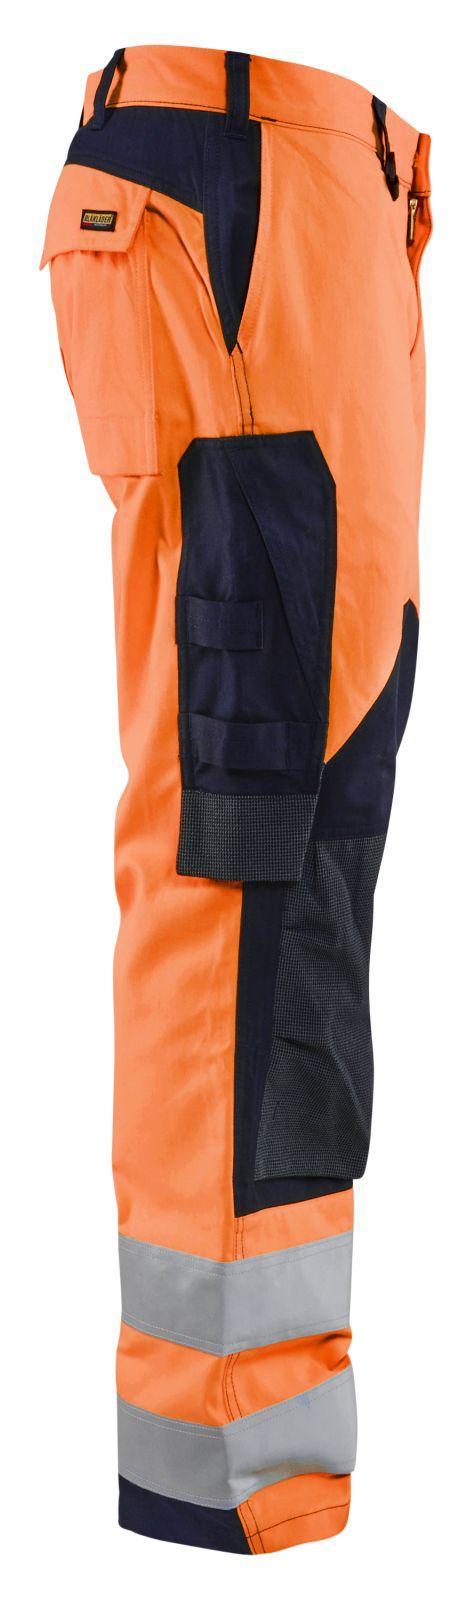 Blaklader Broeken 15881513 Multinorm fluo oranje-marineblauw(5389)